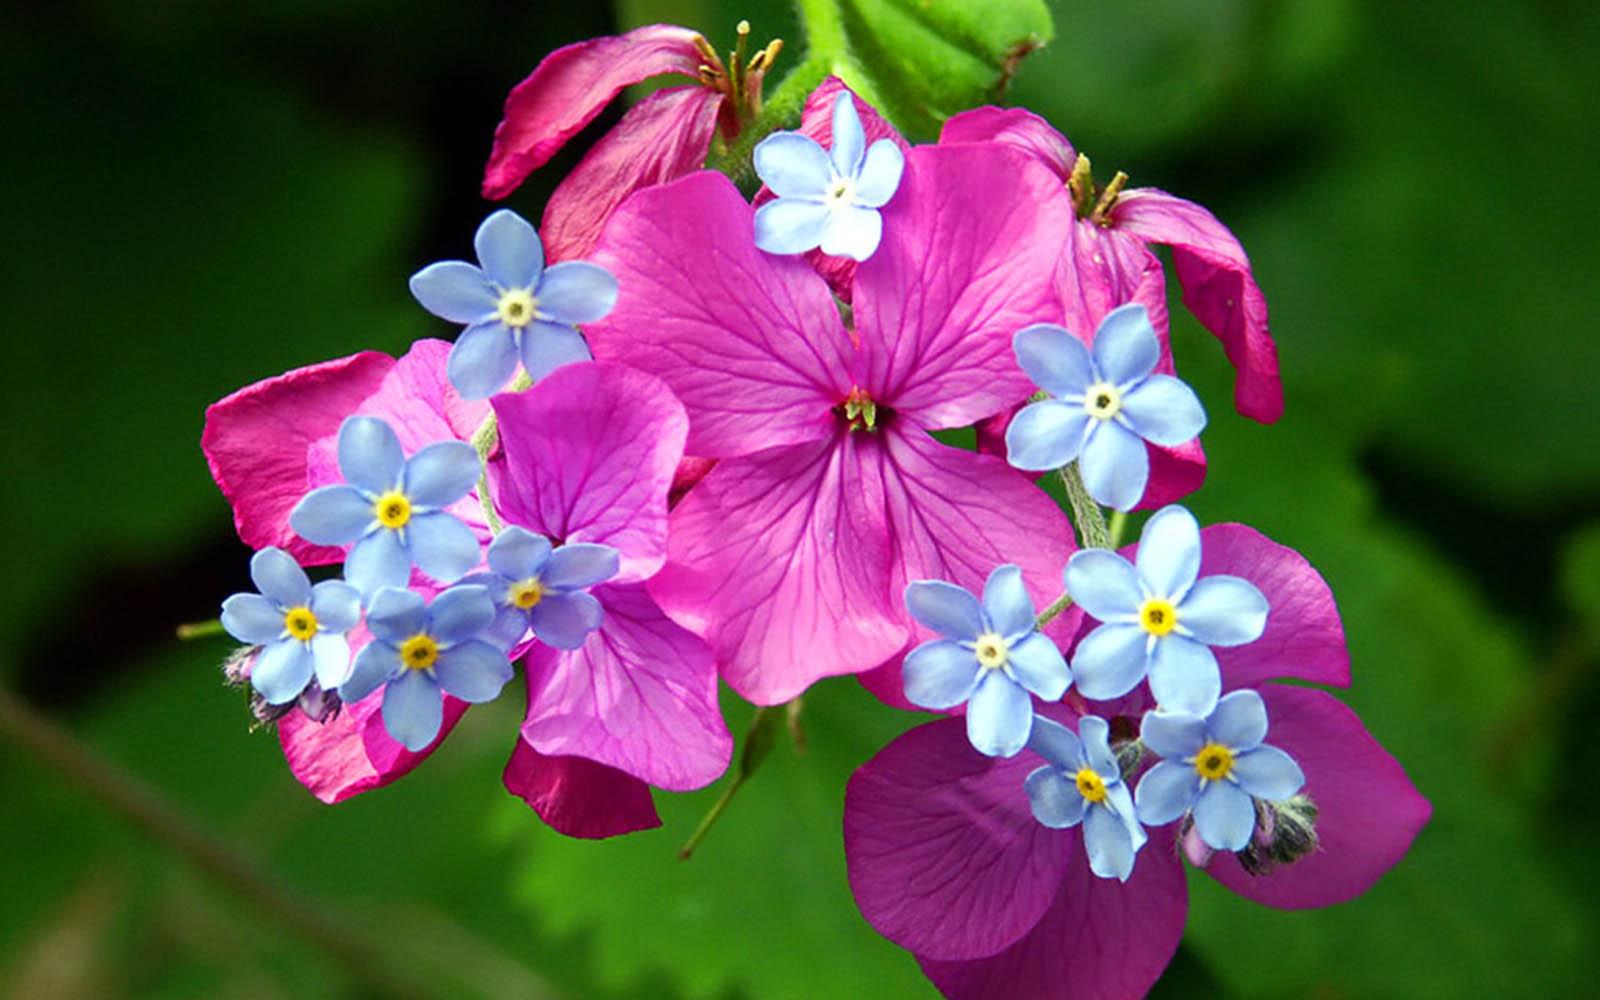 Description Wallpaper Spring Flowers is a hi res Wallpaper for pc 1600x1000